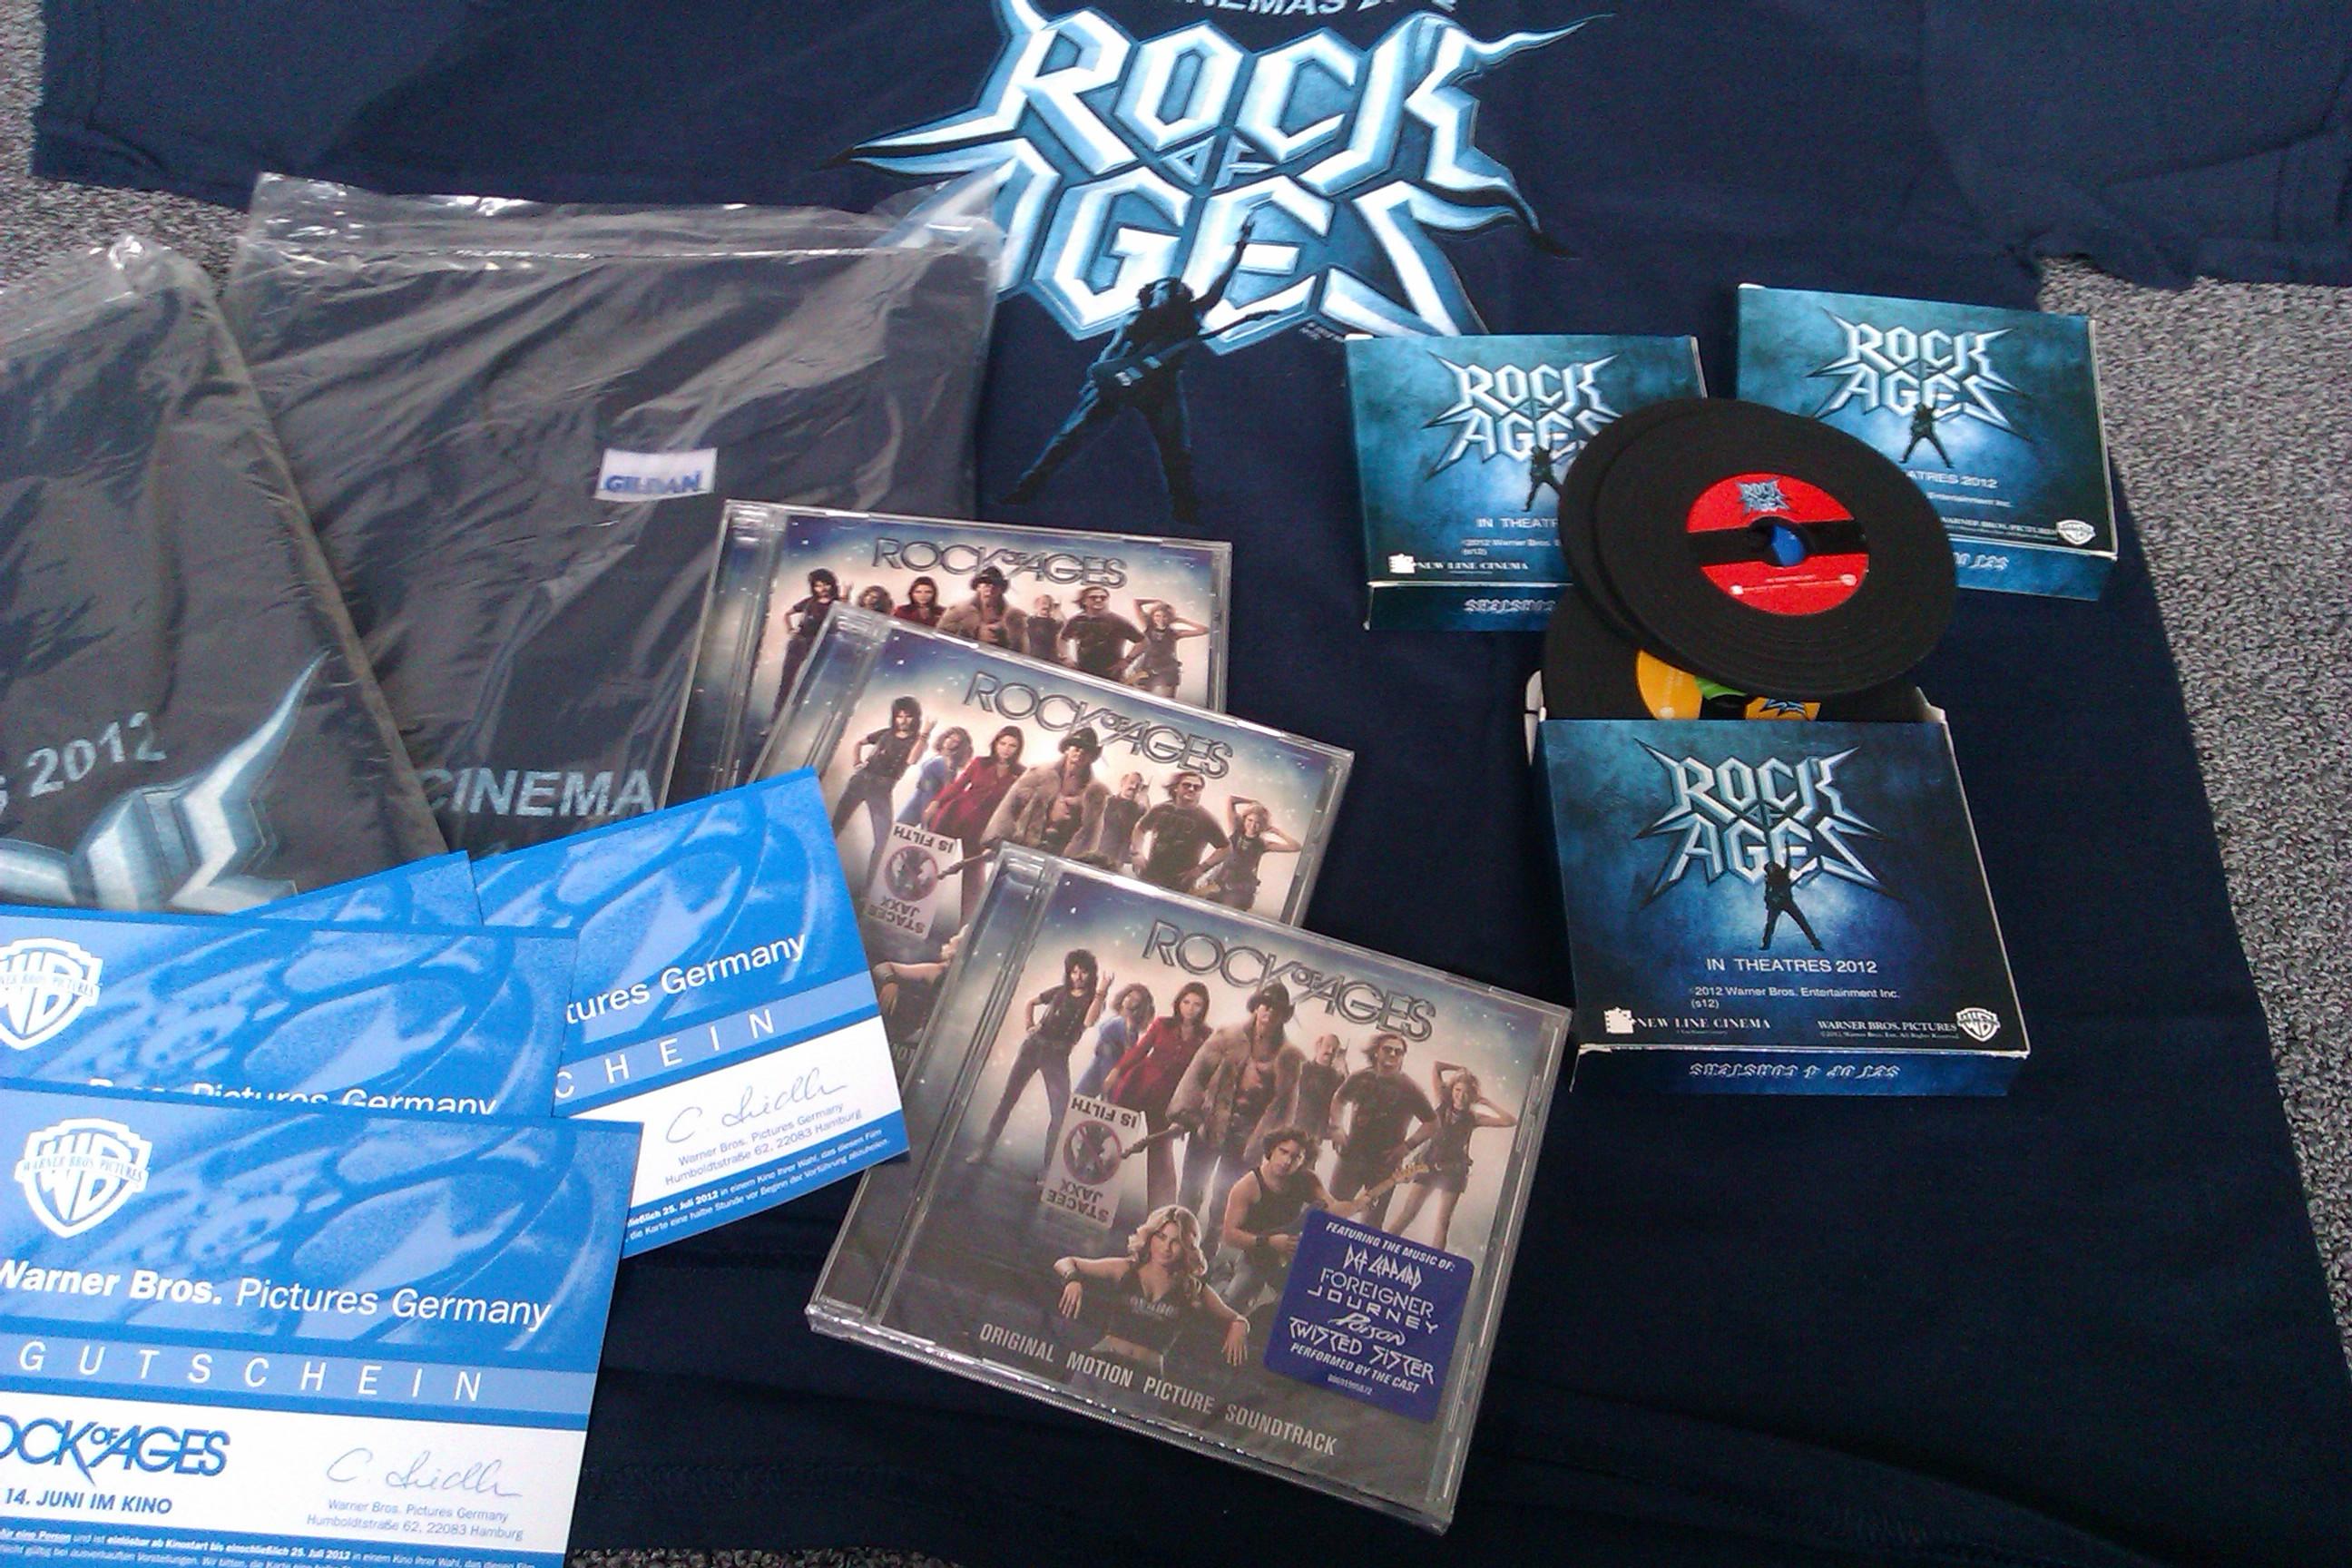 Verlosung zum Musical-Film 'Rock Of Ages'